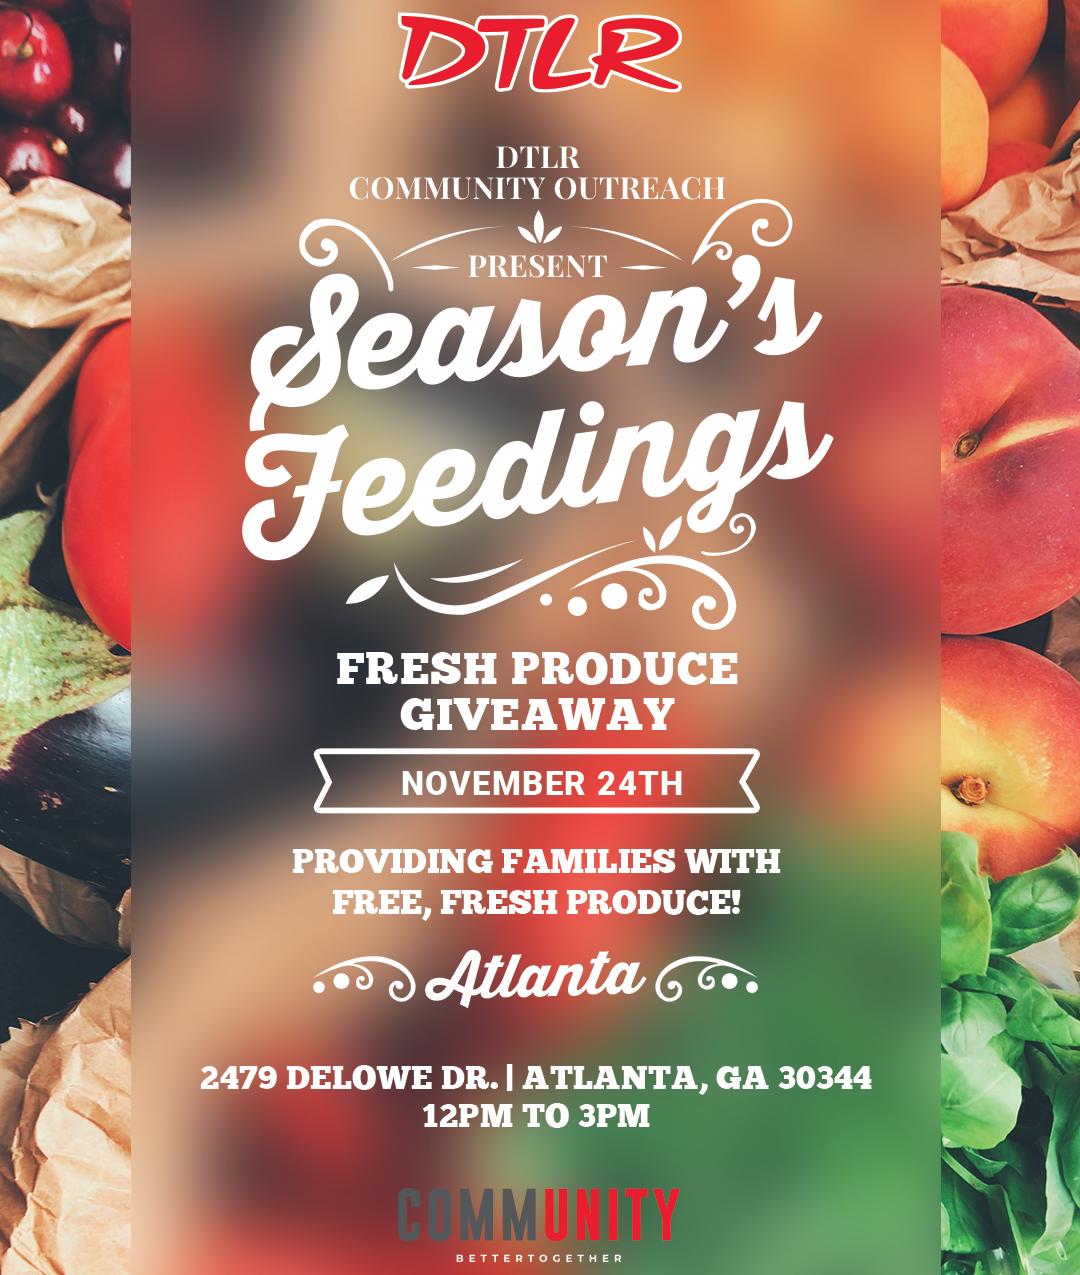 Food Drive Flyer - IG Post - Atlanta